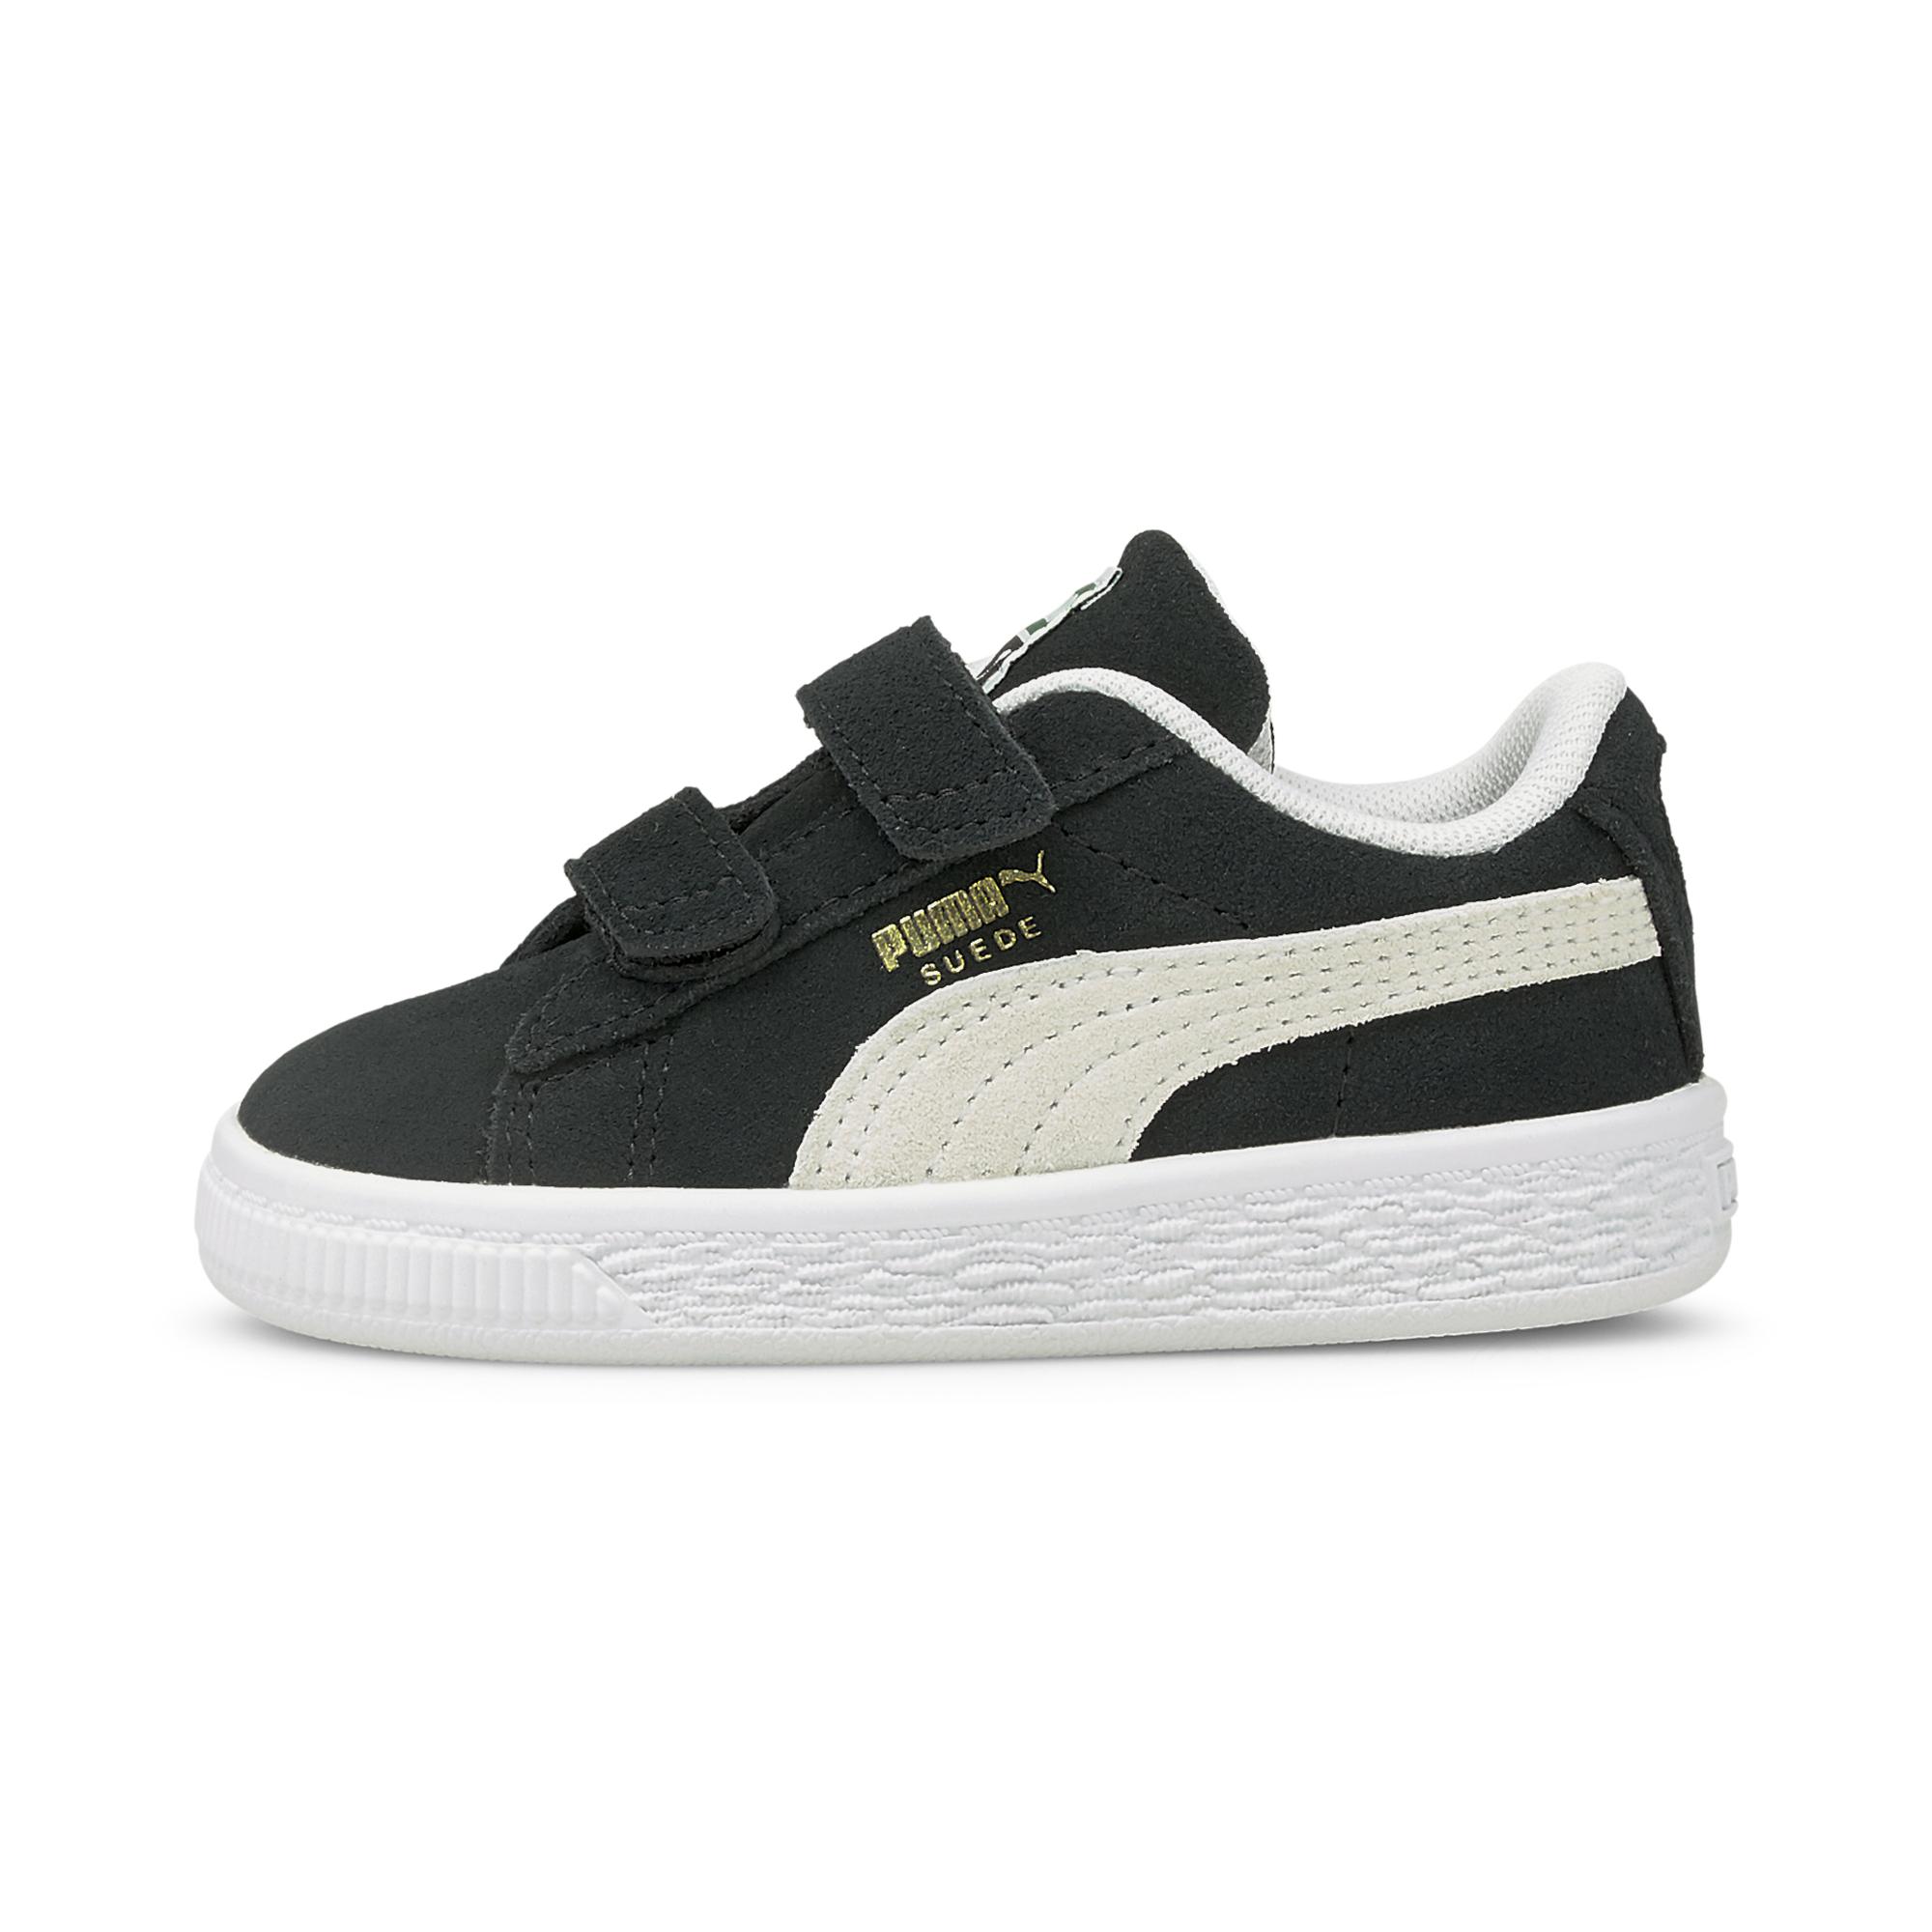 Puma Suede Classic XXI Babies sneakers